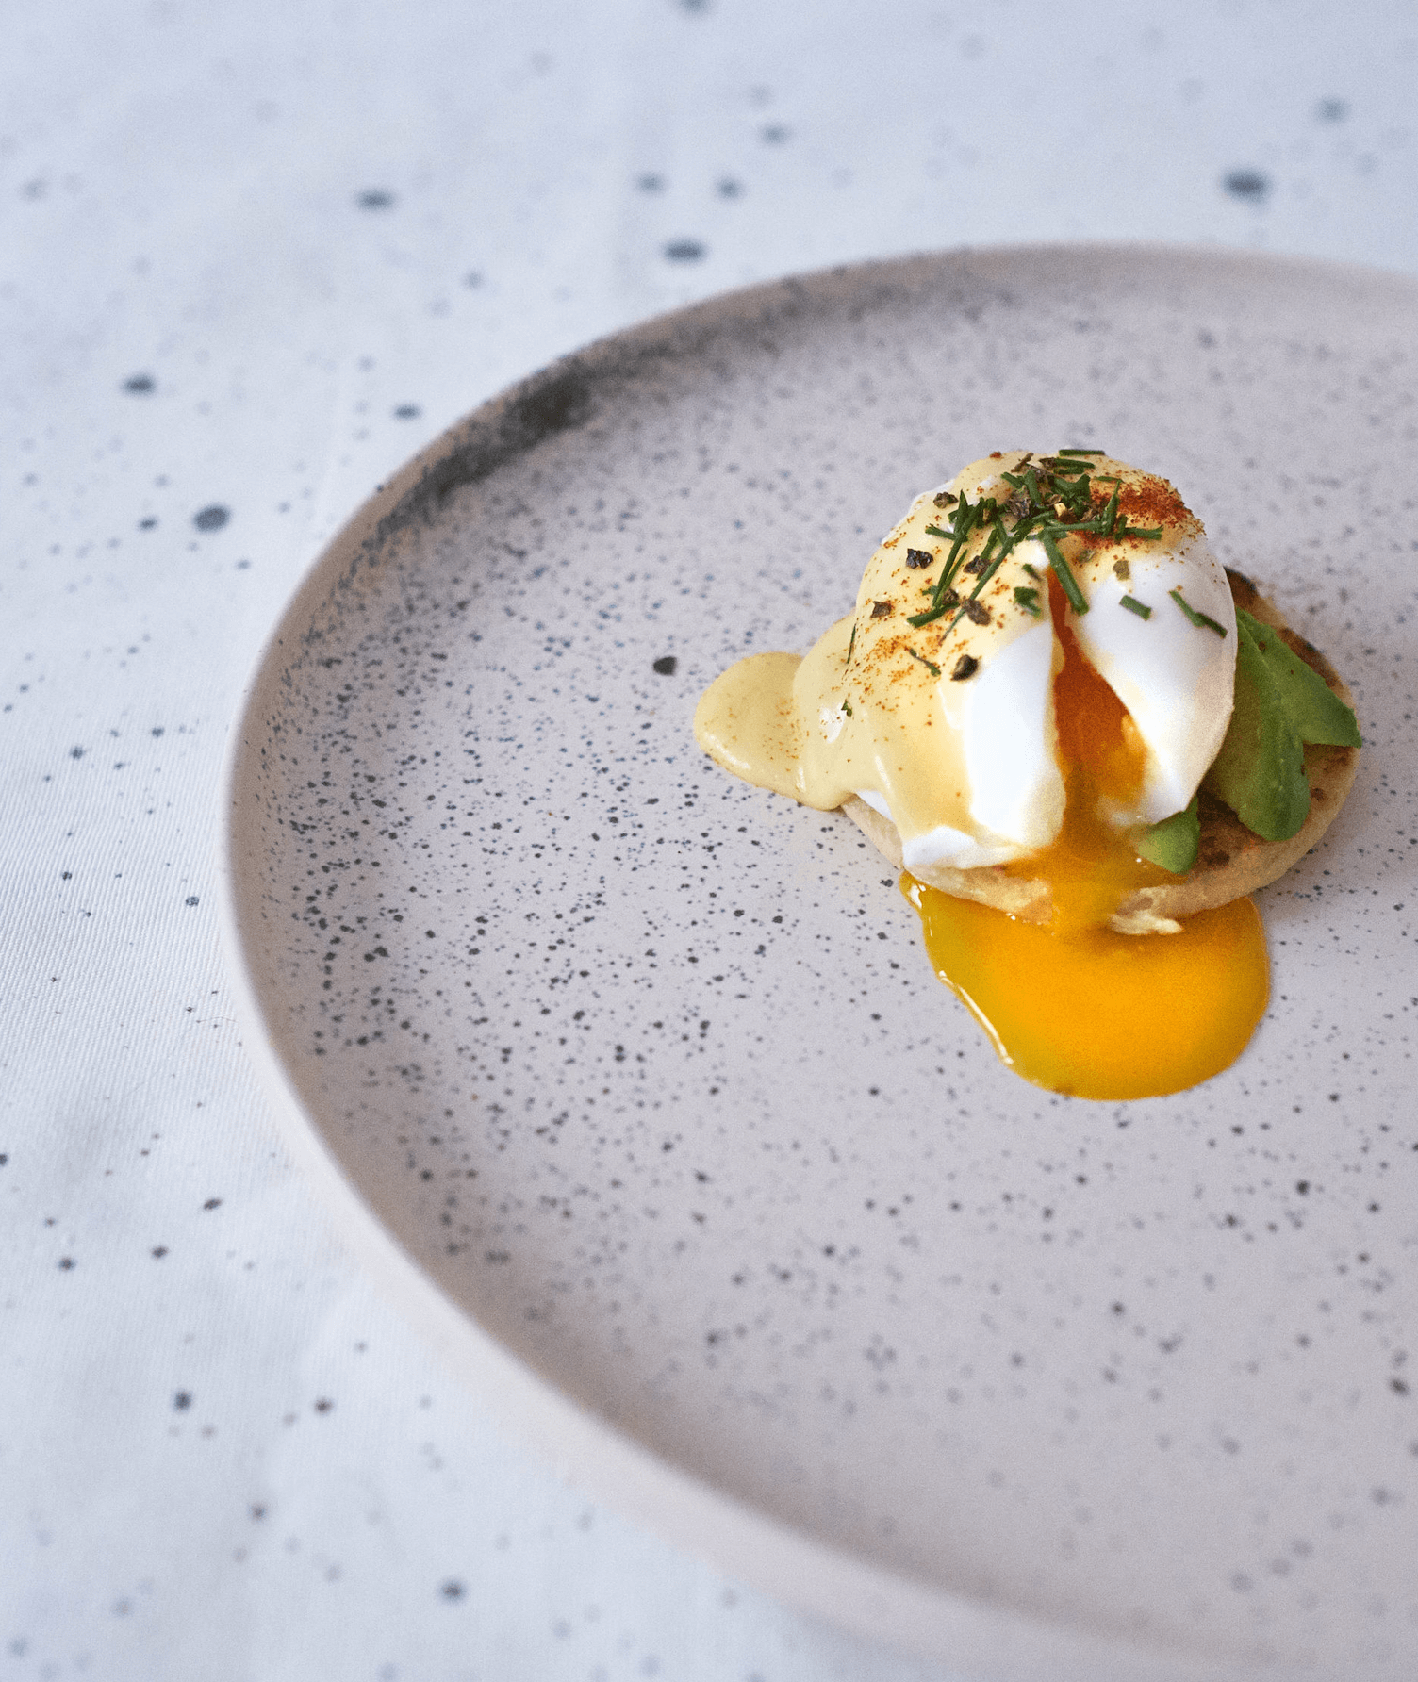 jajka po benedyktyńsku z sosem holenderskim i awokado